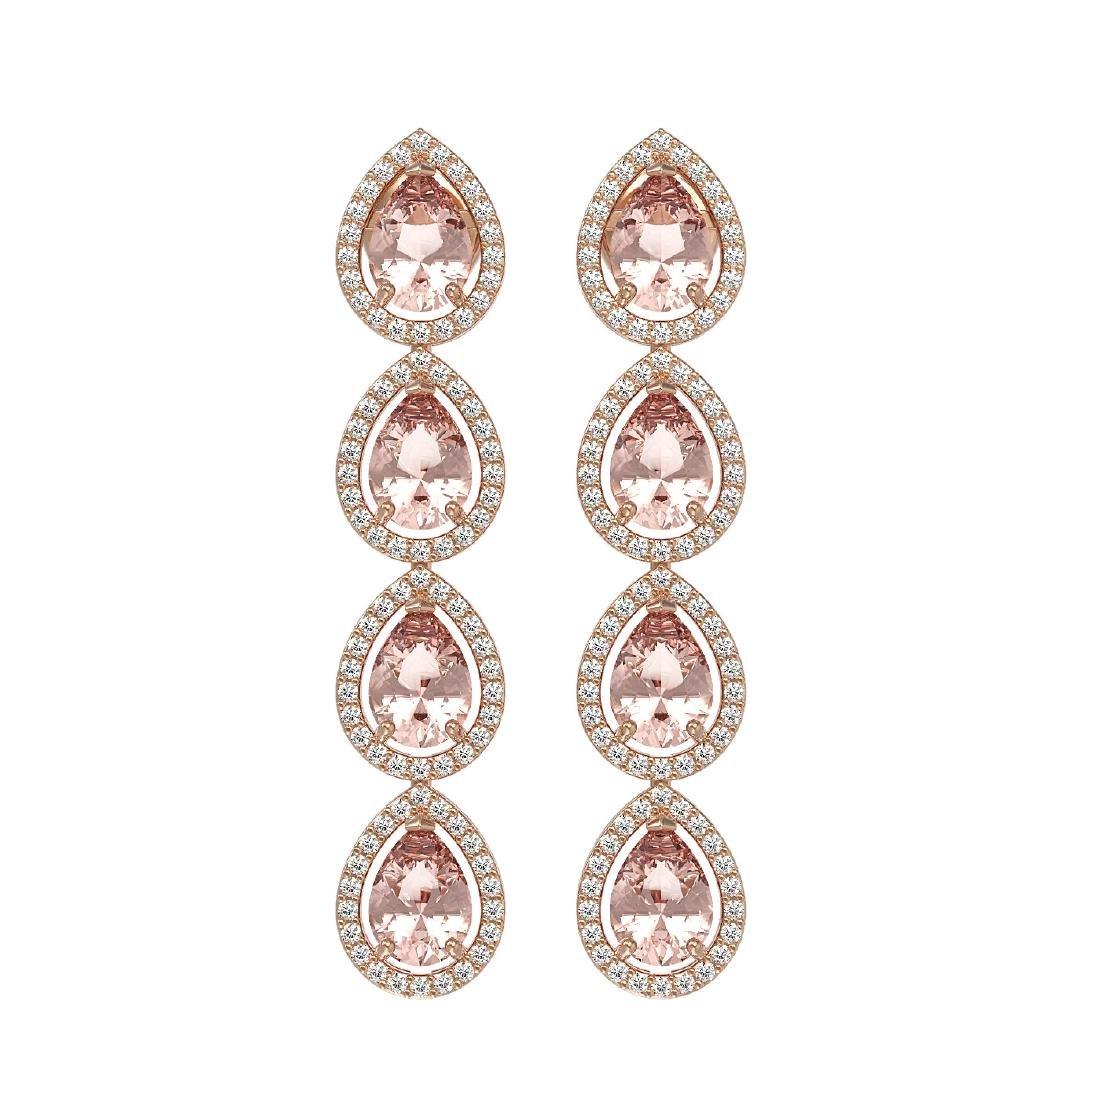 7.8 CTW Morganite & Diamond Halo Earrings 10K Rose Gold